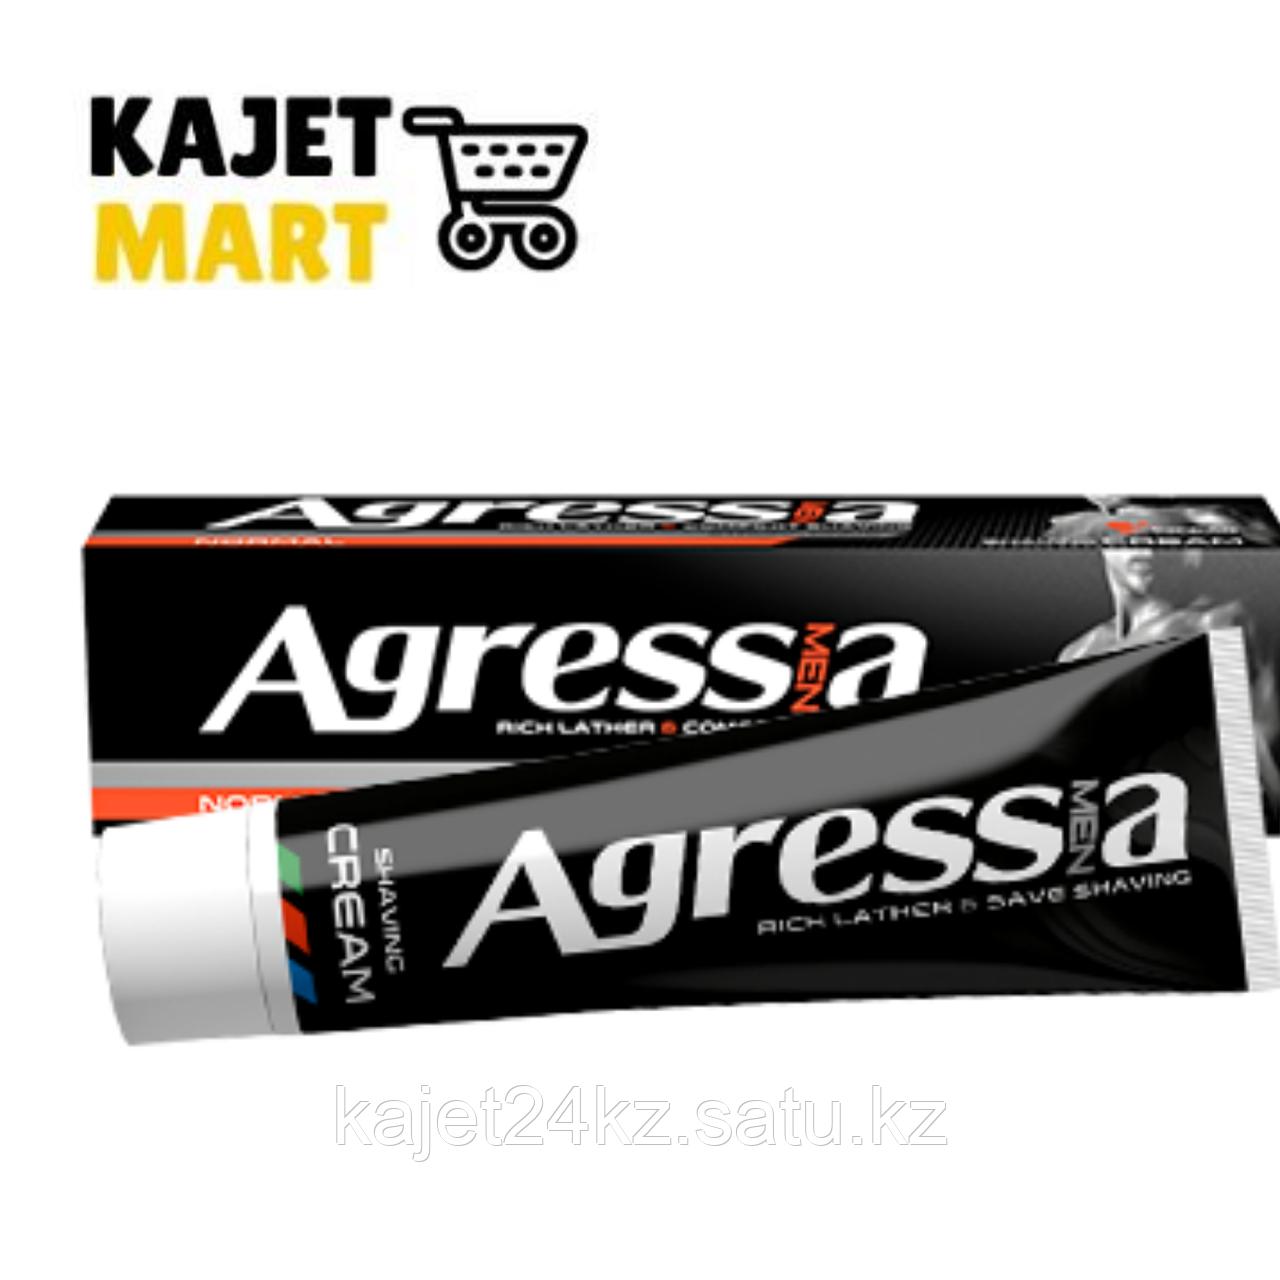 Крем для бритья Agressia Normal 100мл.